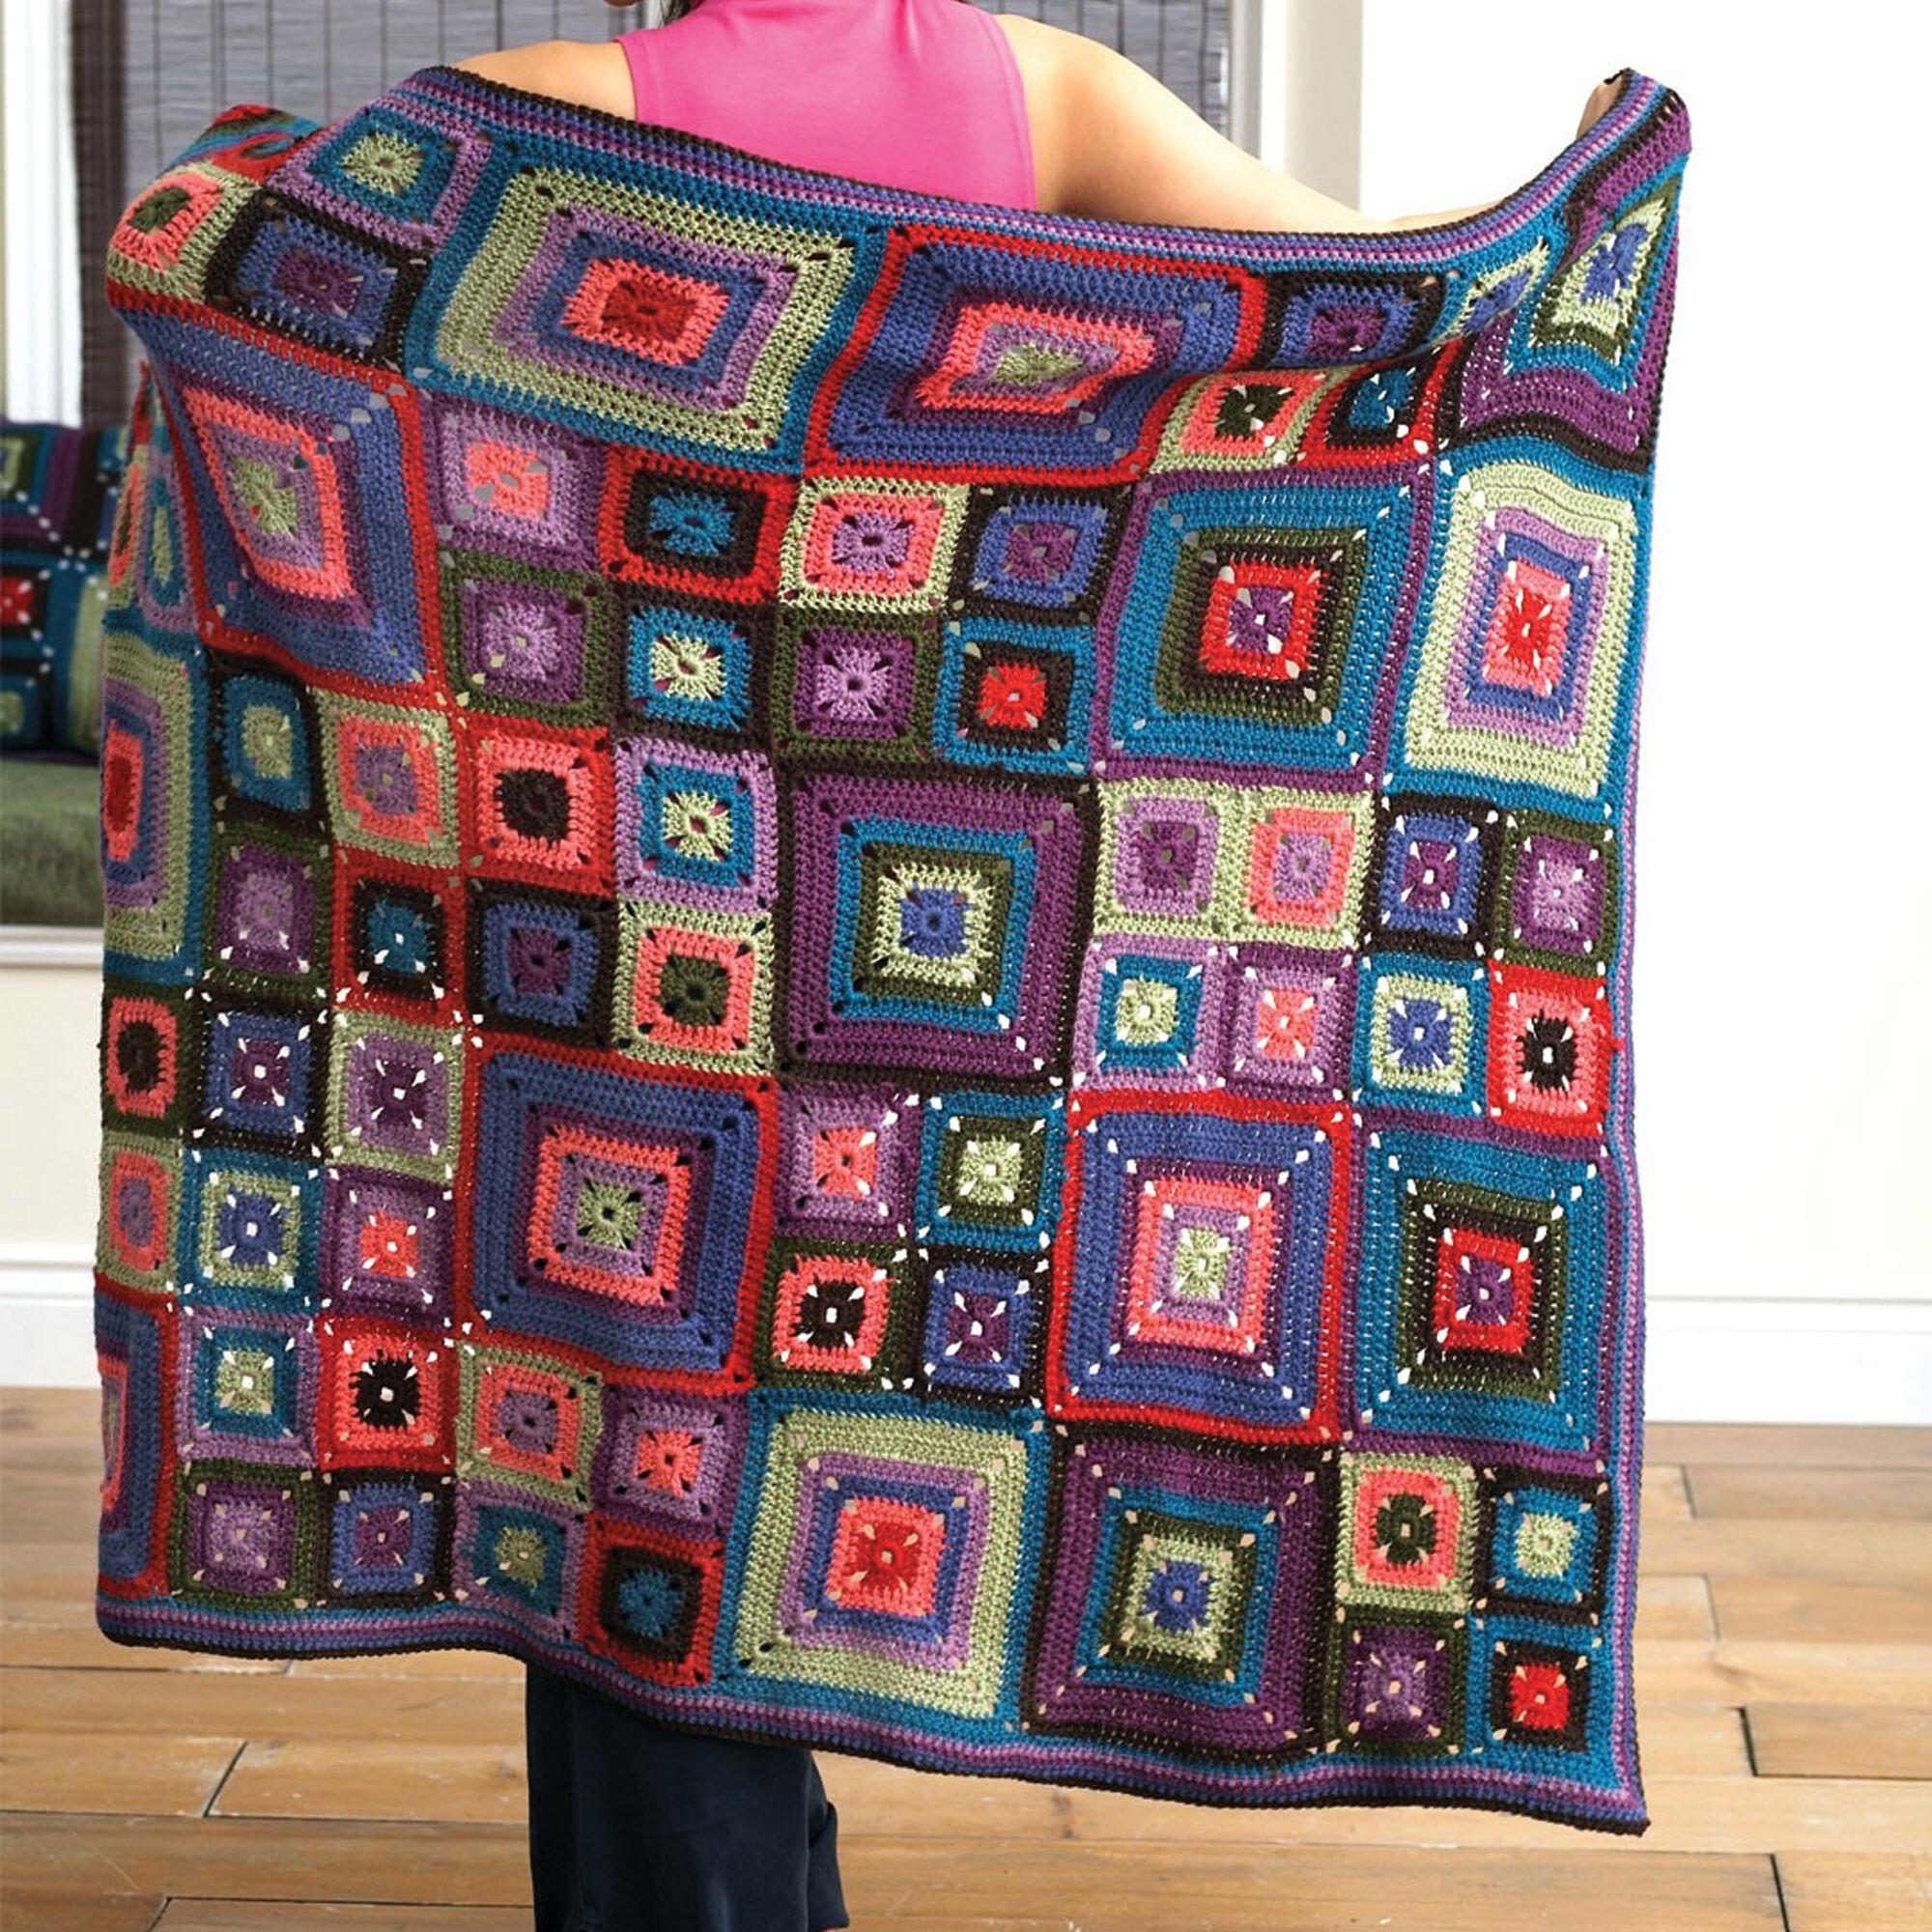 patons bright squares blanket pillow set blanket pattern